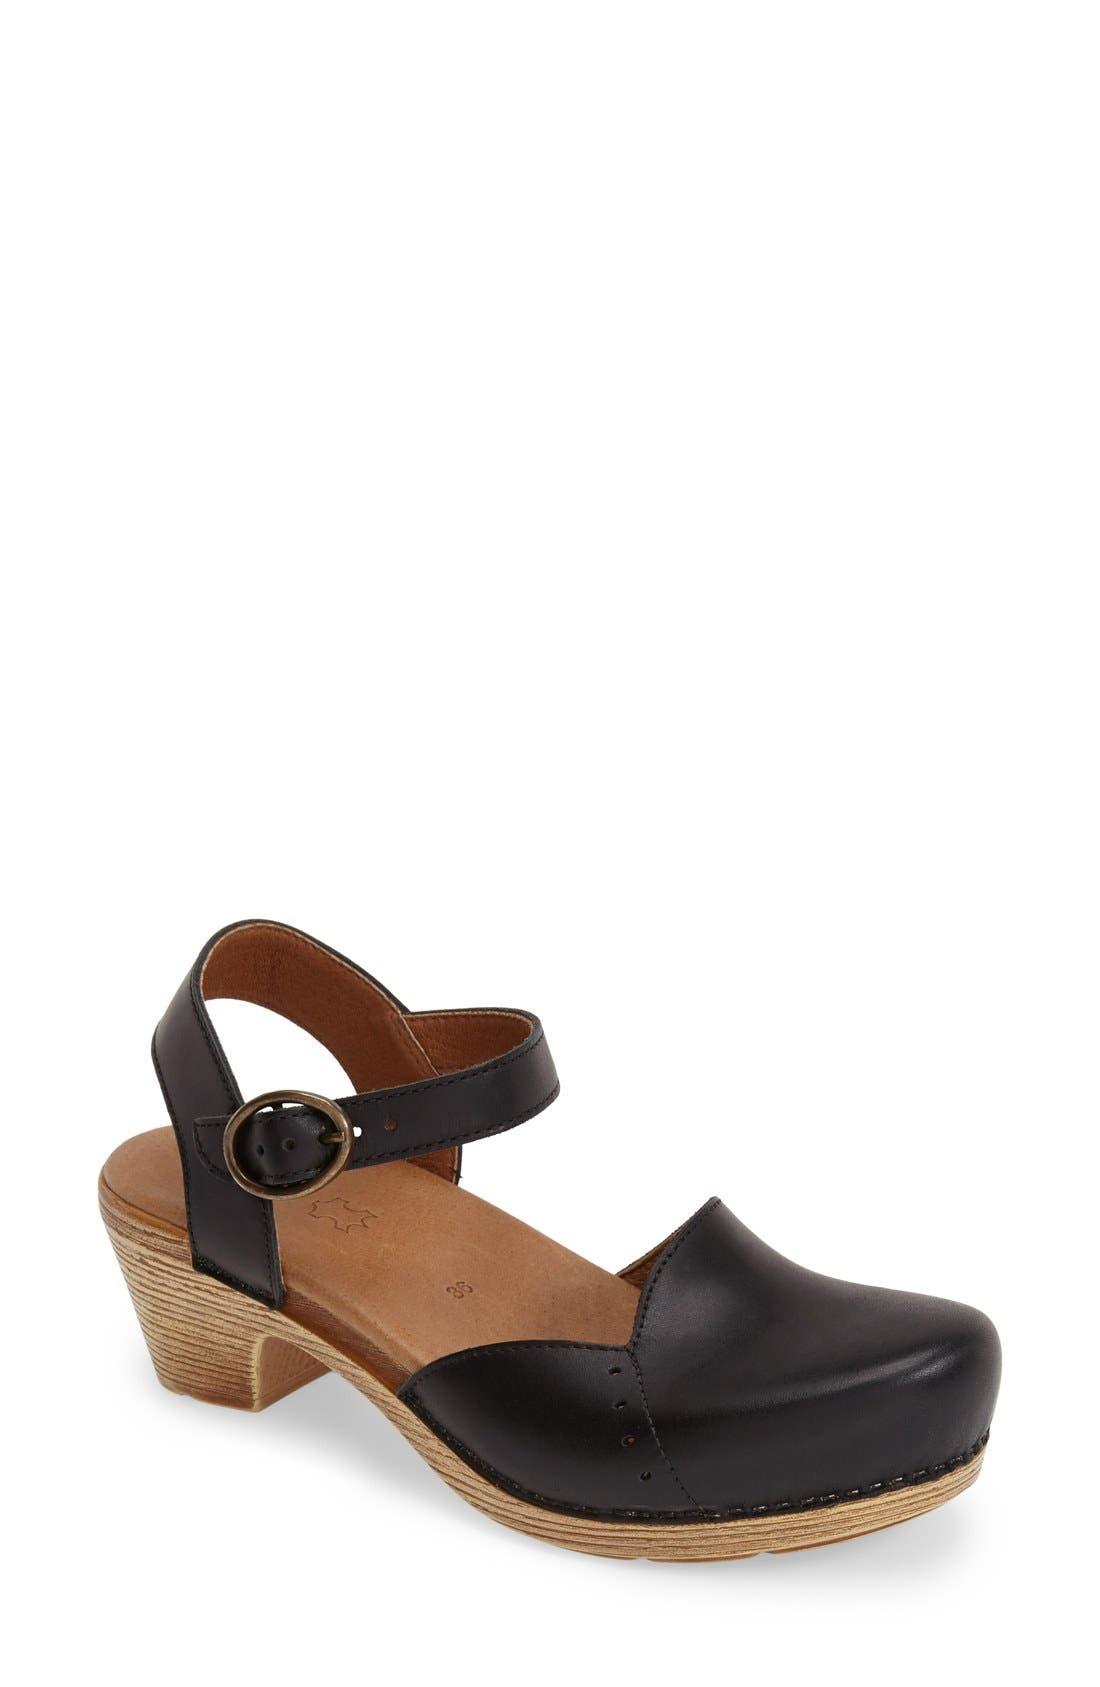 'Maisie' Ankle Strap Leather Pump,                             Main thumbnail 1, color,                             001